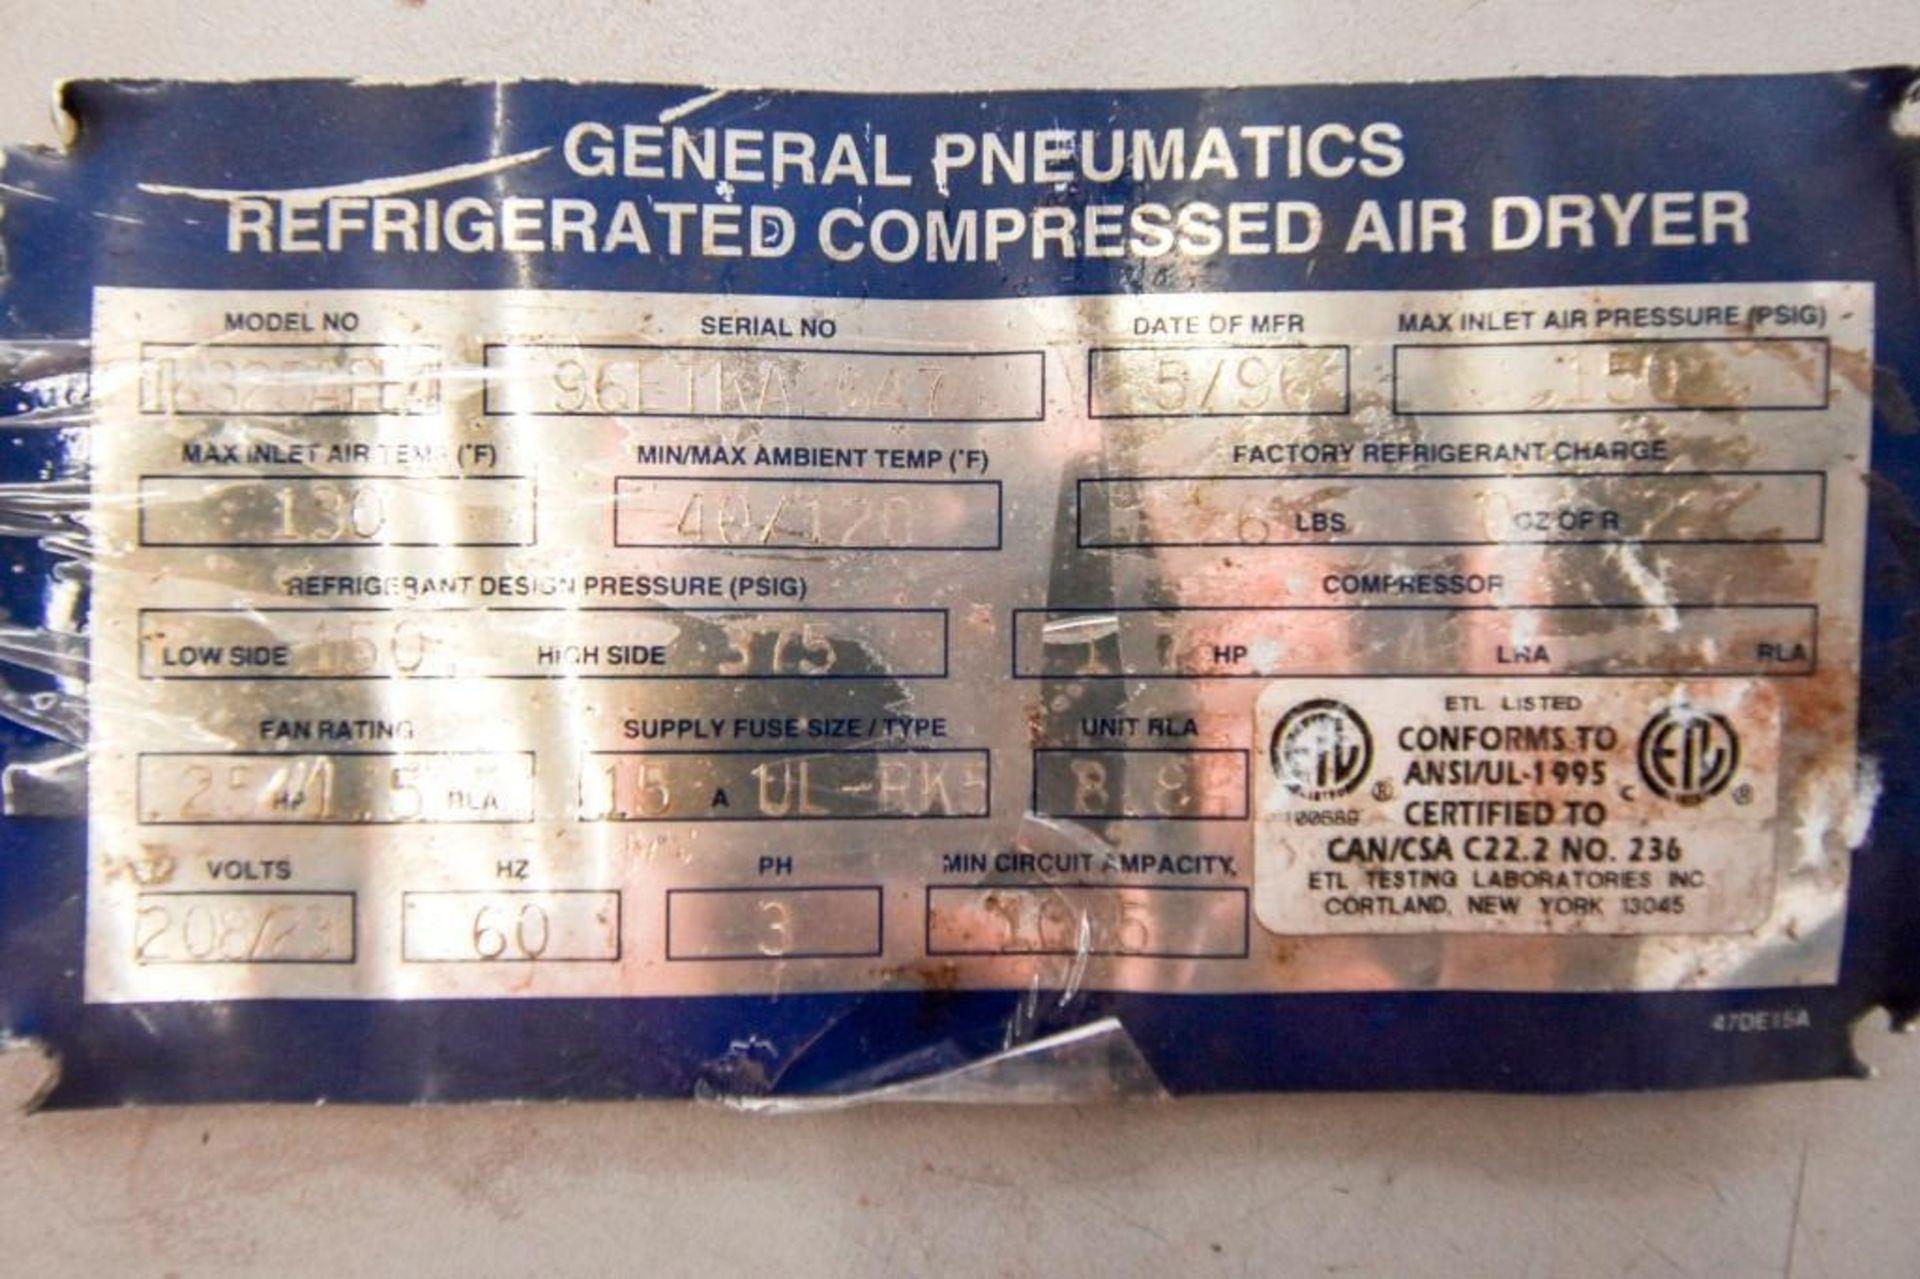 General Pneumatics Compressed Air Dryer - Image 7 of 12